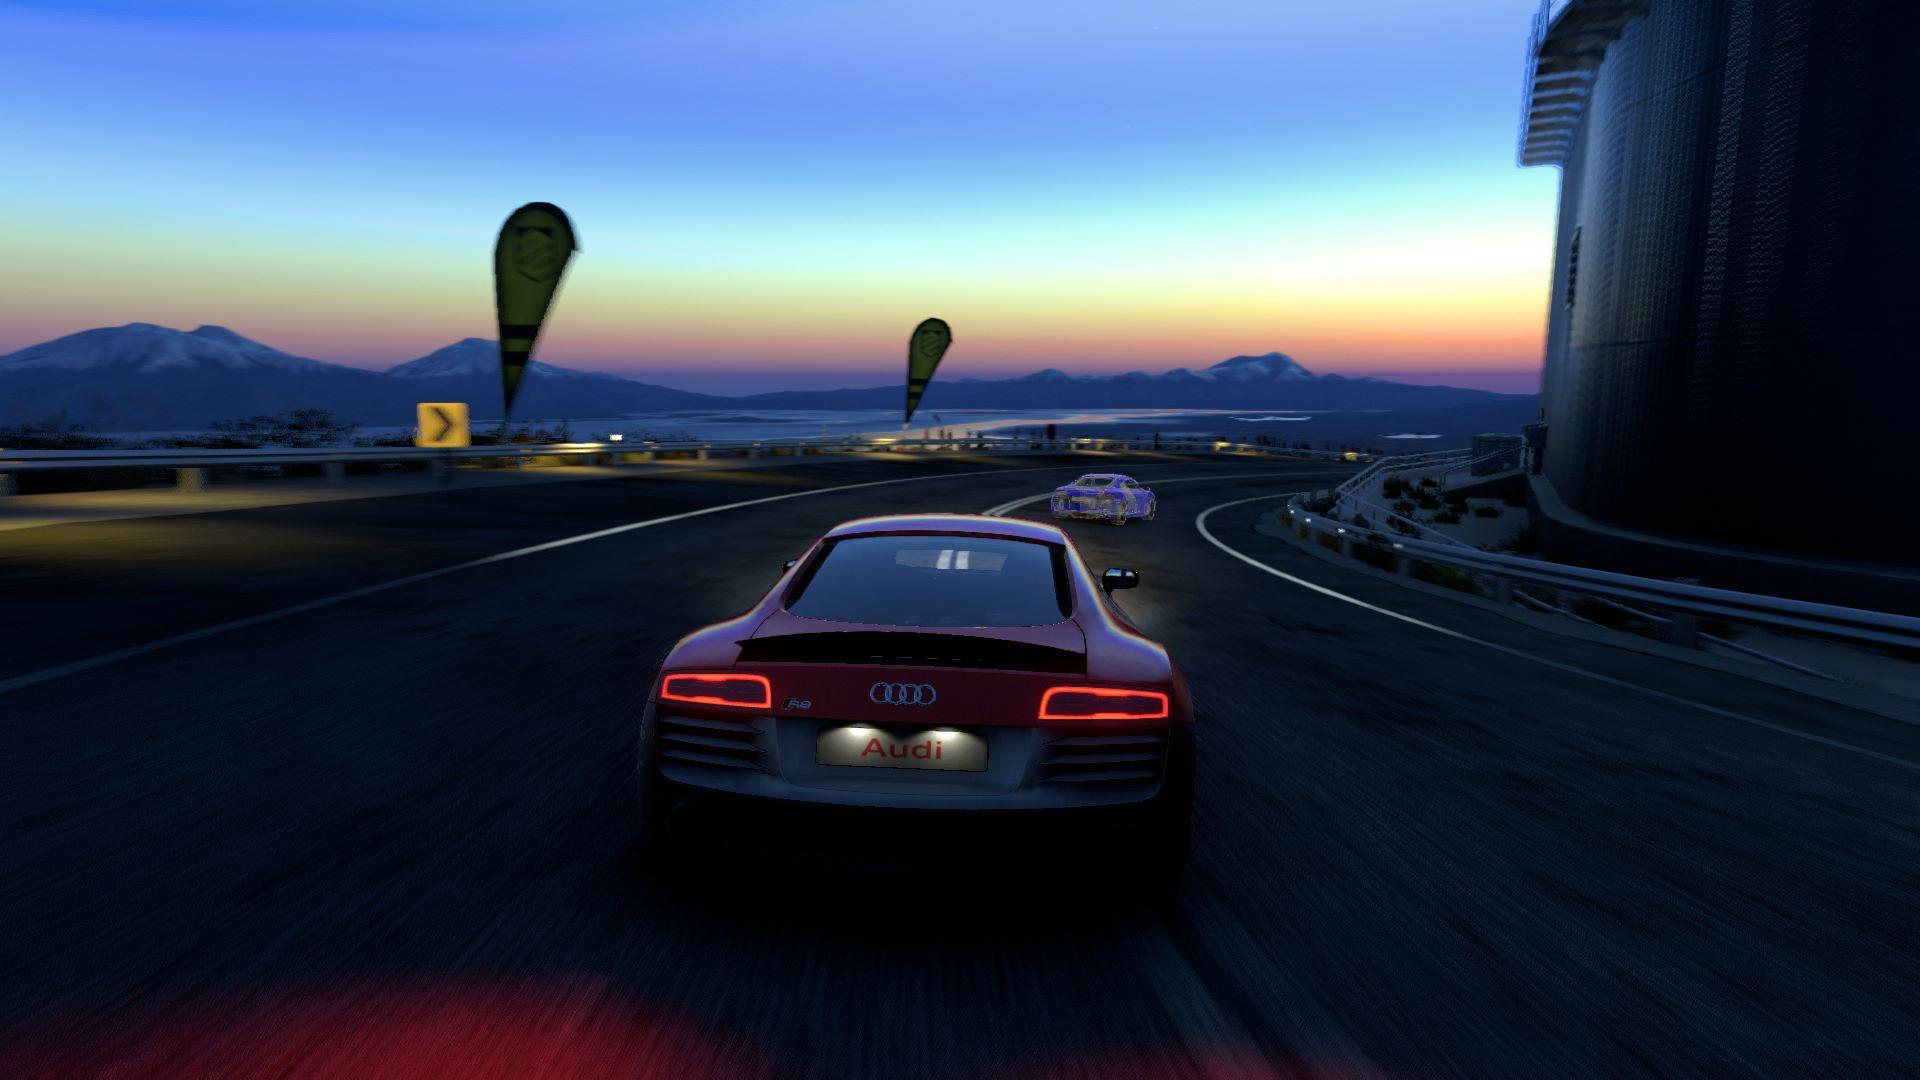 Driveclub night gameplay coming tomorrow - Gematsu